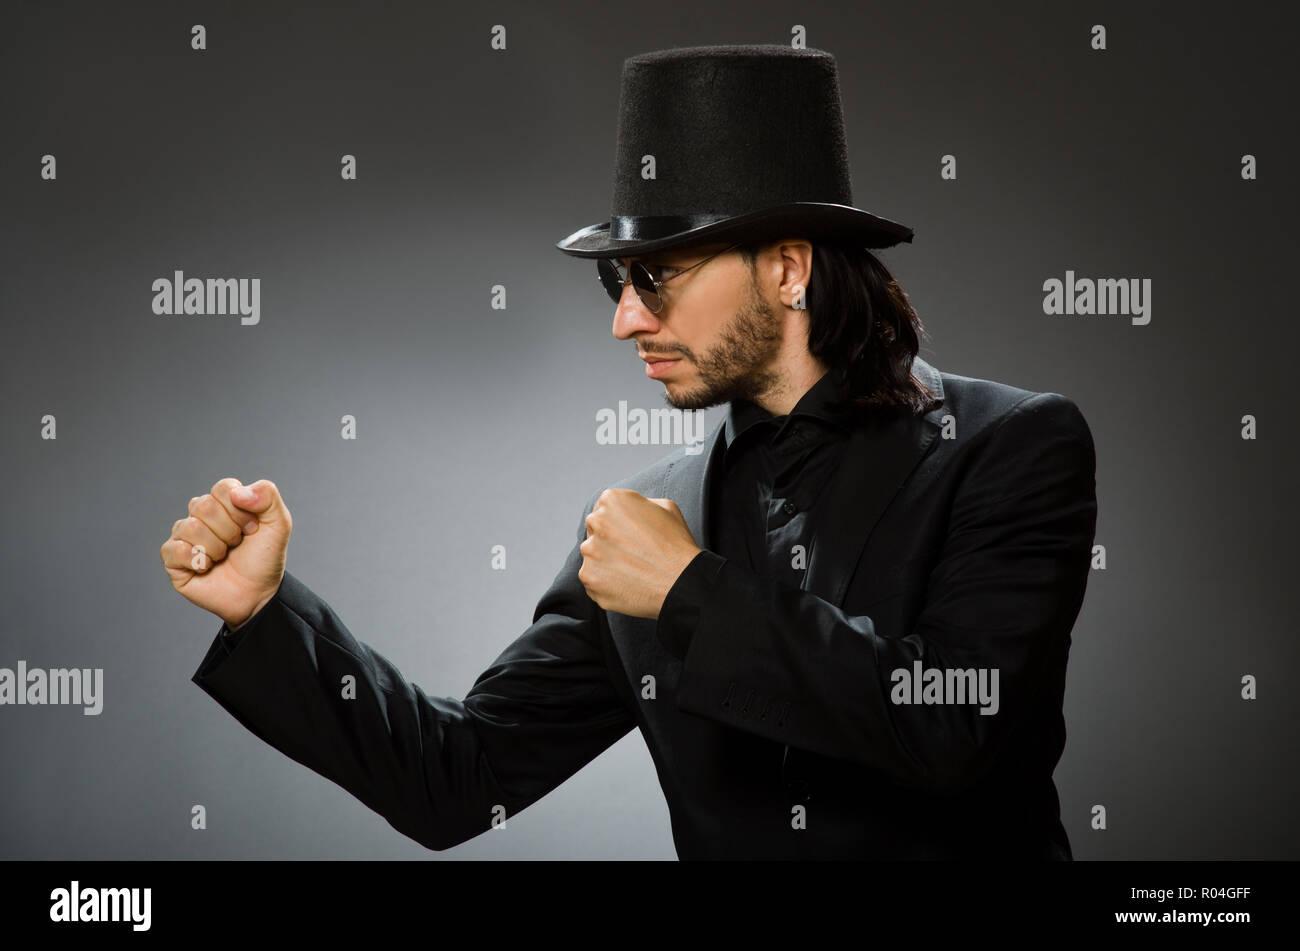 192754608e3 Man Wearing Derby Hat Boxing Stock Photos   Man Wearing Derby Hat ...